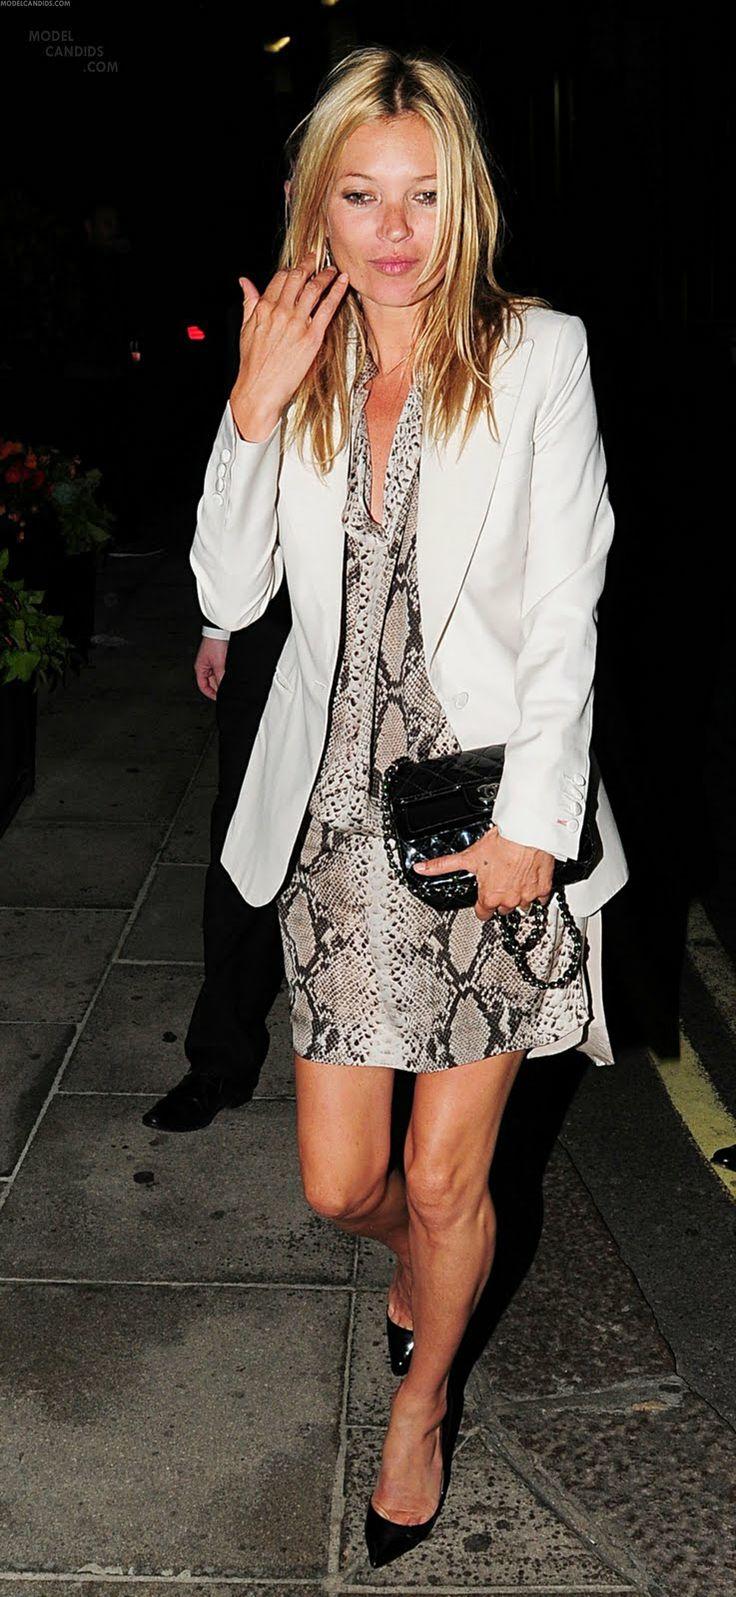 Kate Moss in snake print dress